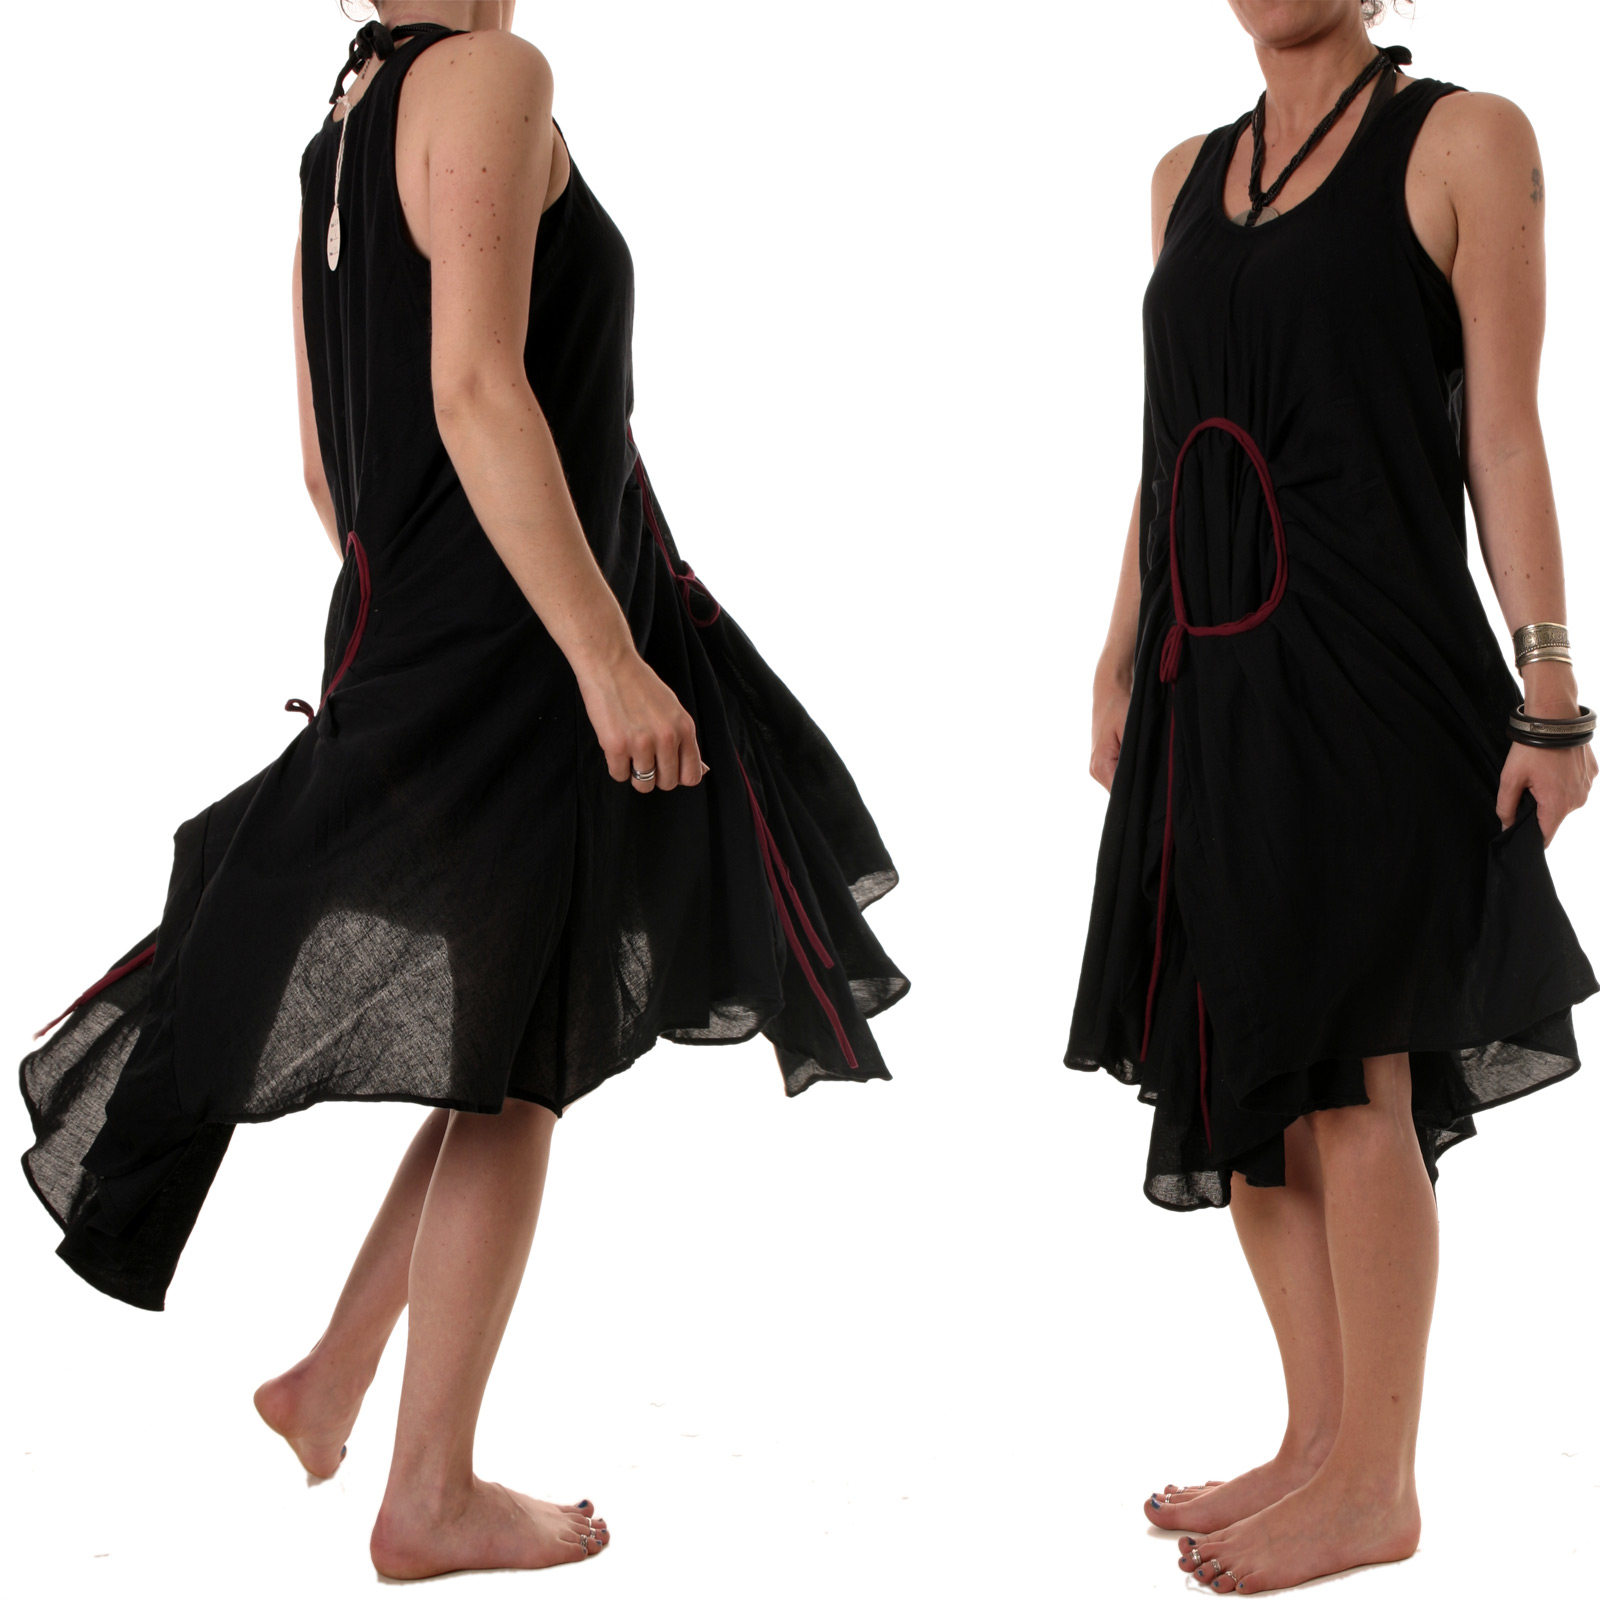 lagenlook kleid hippie ethno sommerkleid tunika strandkleid goa zipfelkleid xxl ebay. Black Bedroom Furniture Sets. Home Design Ideas